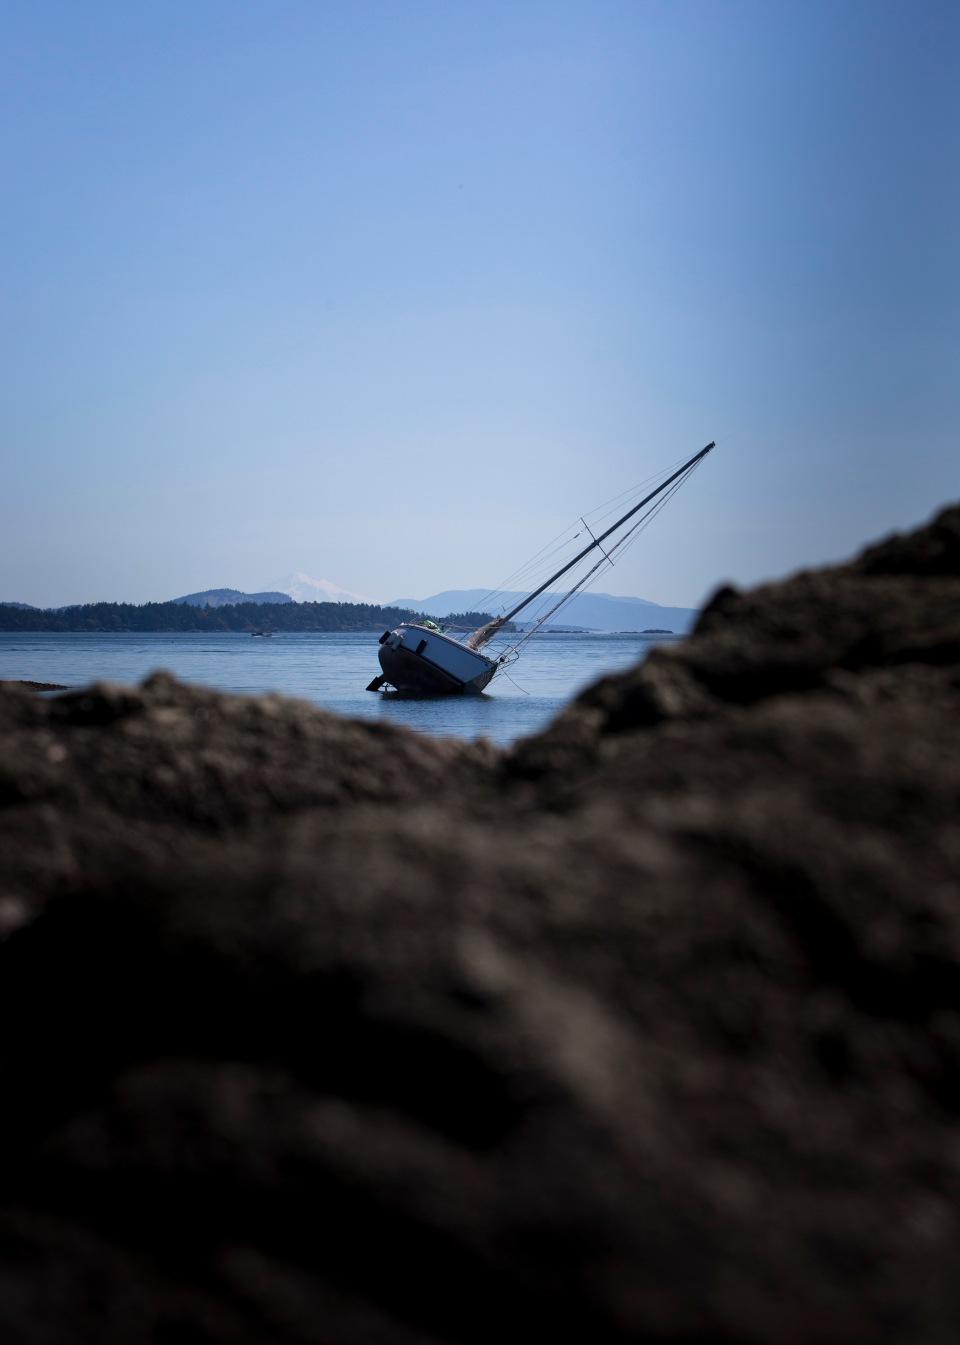 A rocky ride